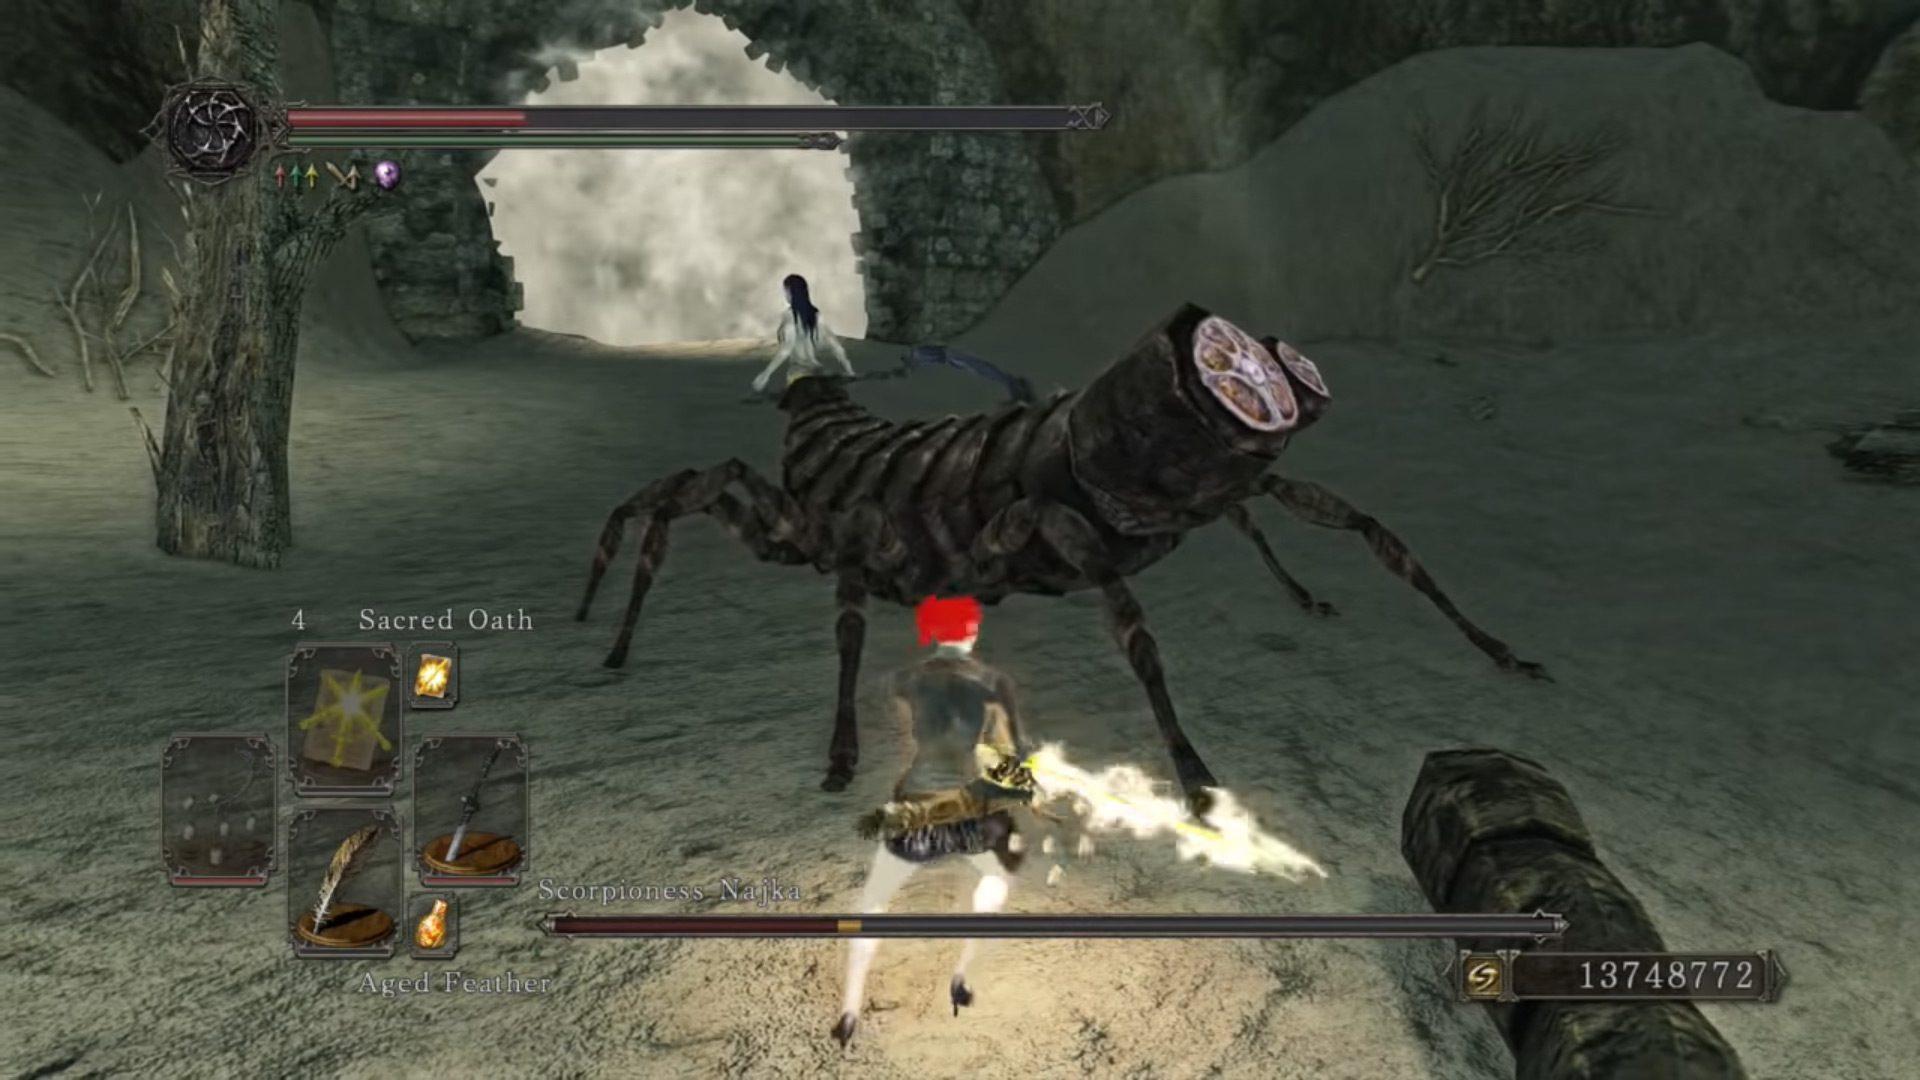 Cutting off a Najka's stinger in Dark Souls II